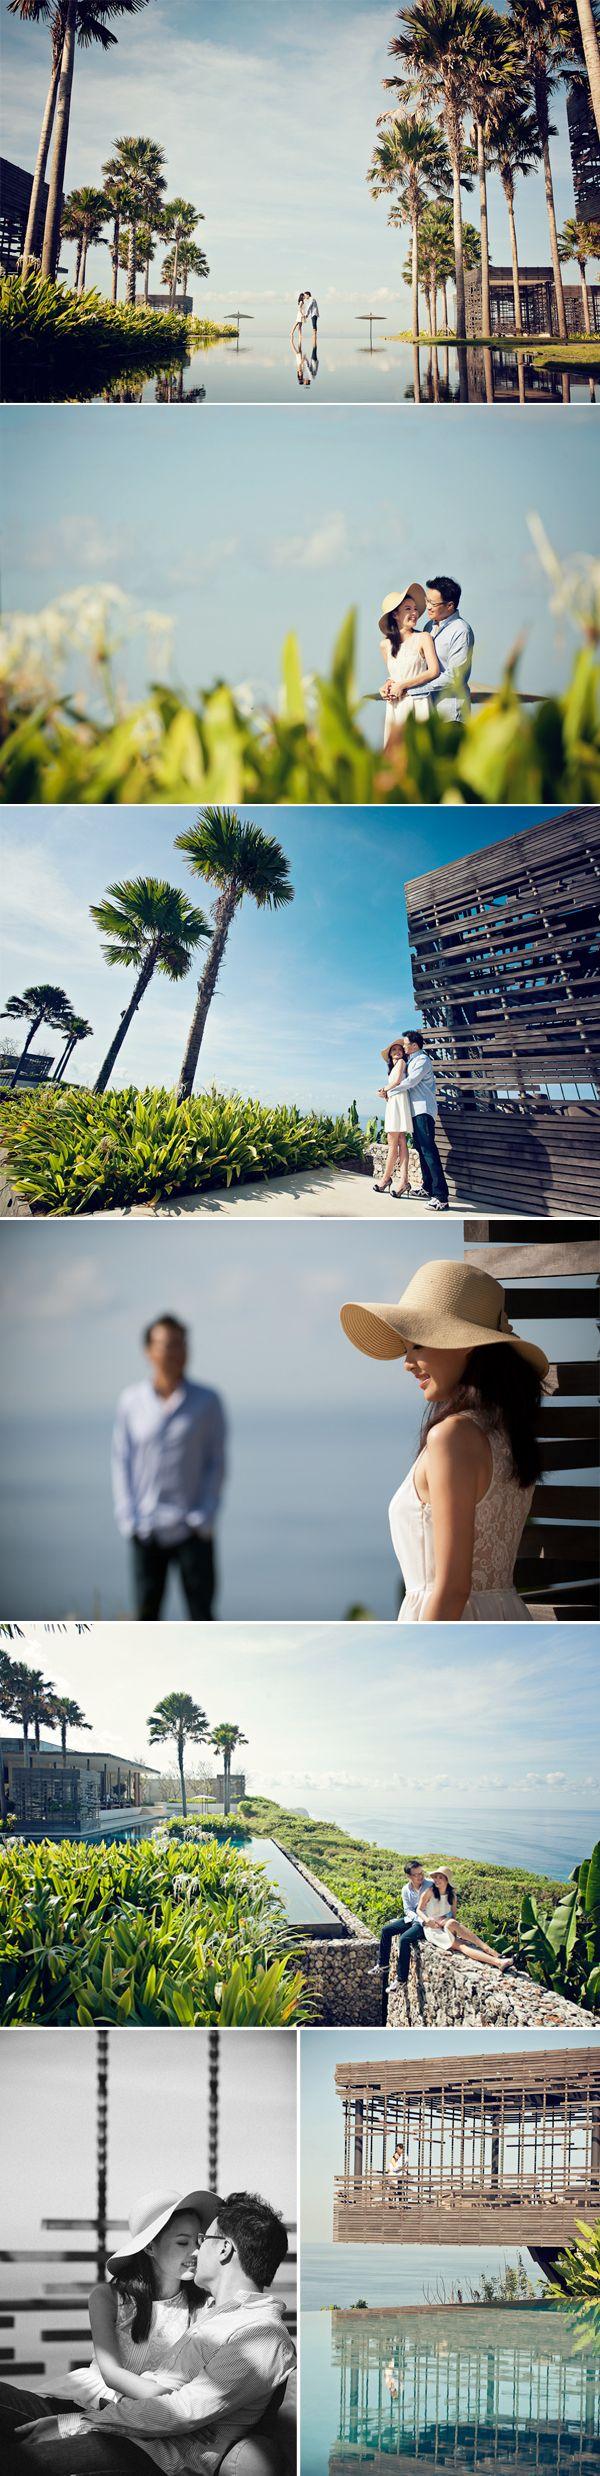 Bali Pre-Wedding Session from Daren Chong